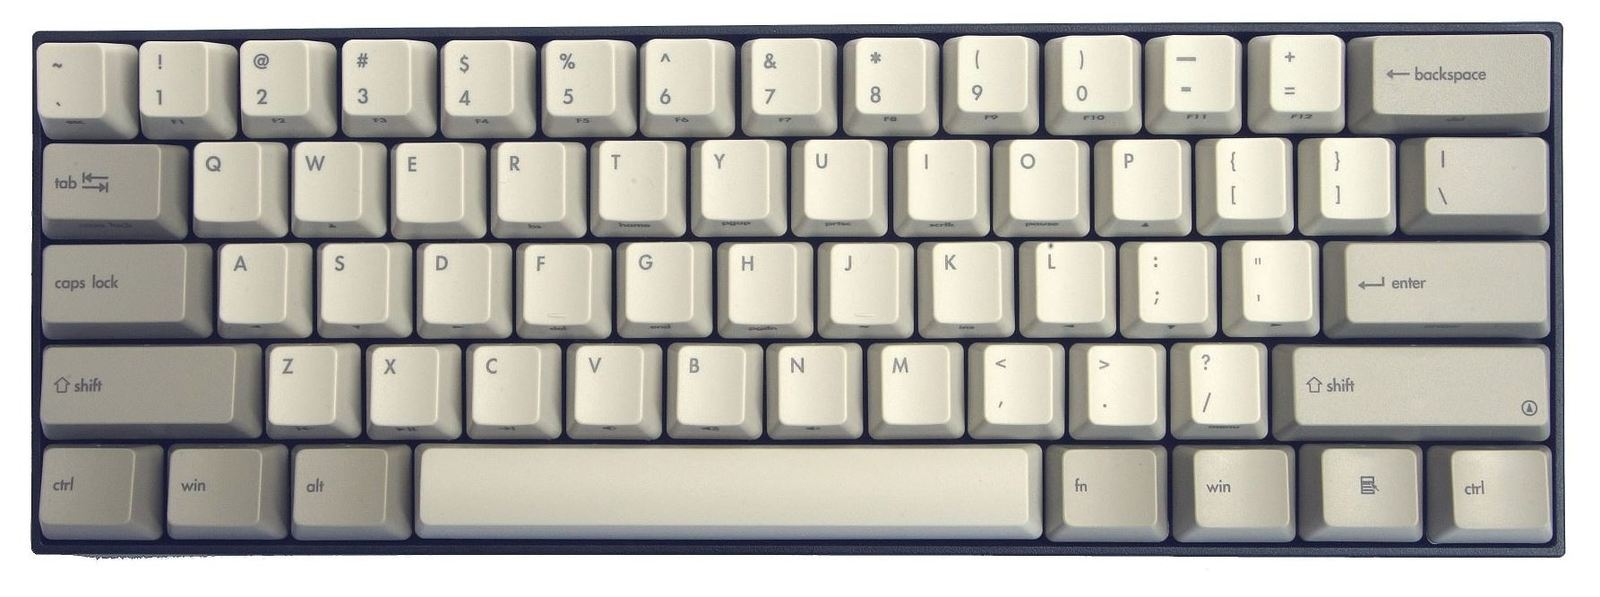 V60 Vintage ABS Keycap Mini Mechanical Keyboard - MX Silent Red image